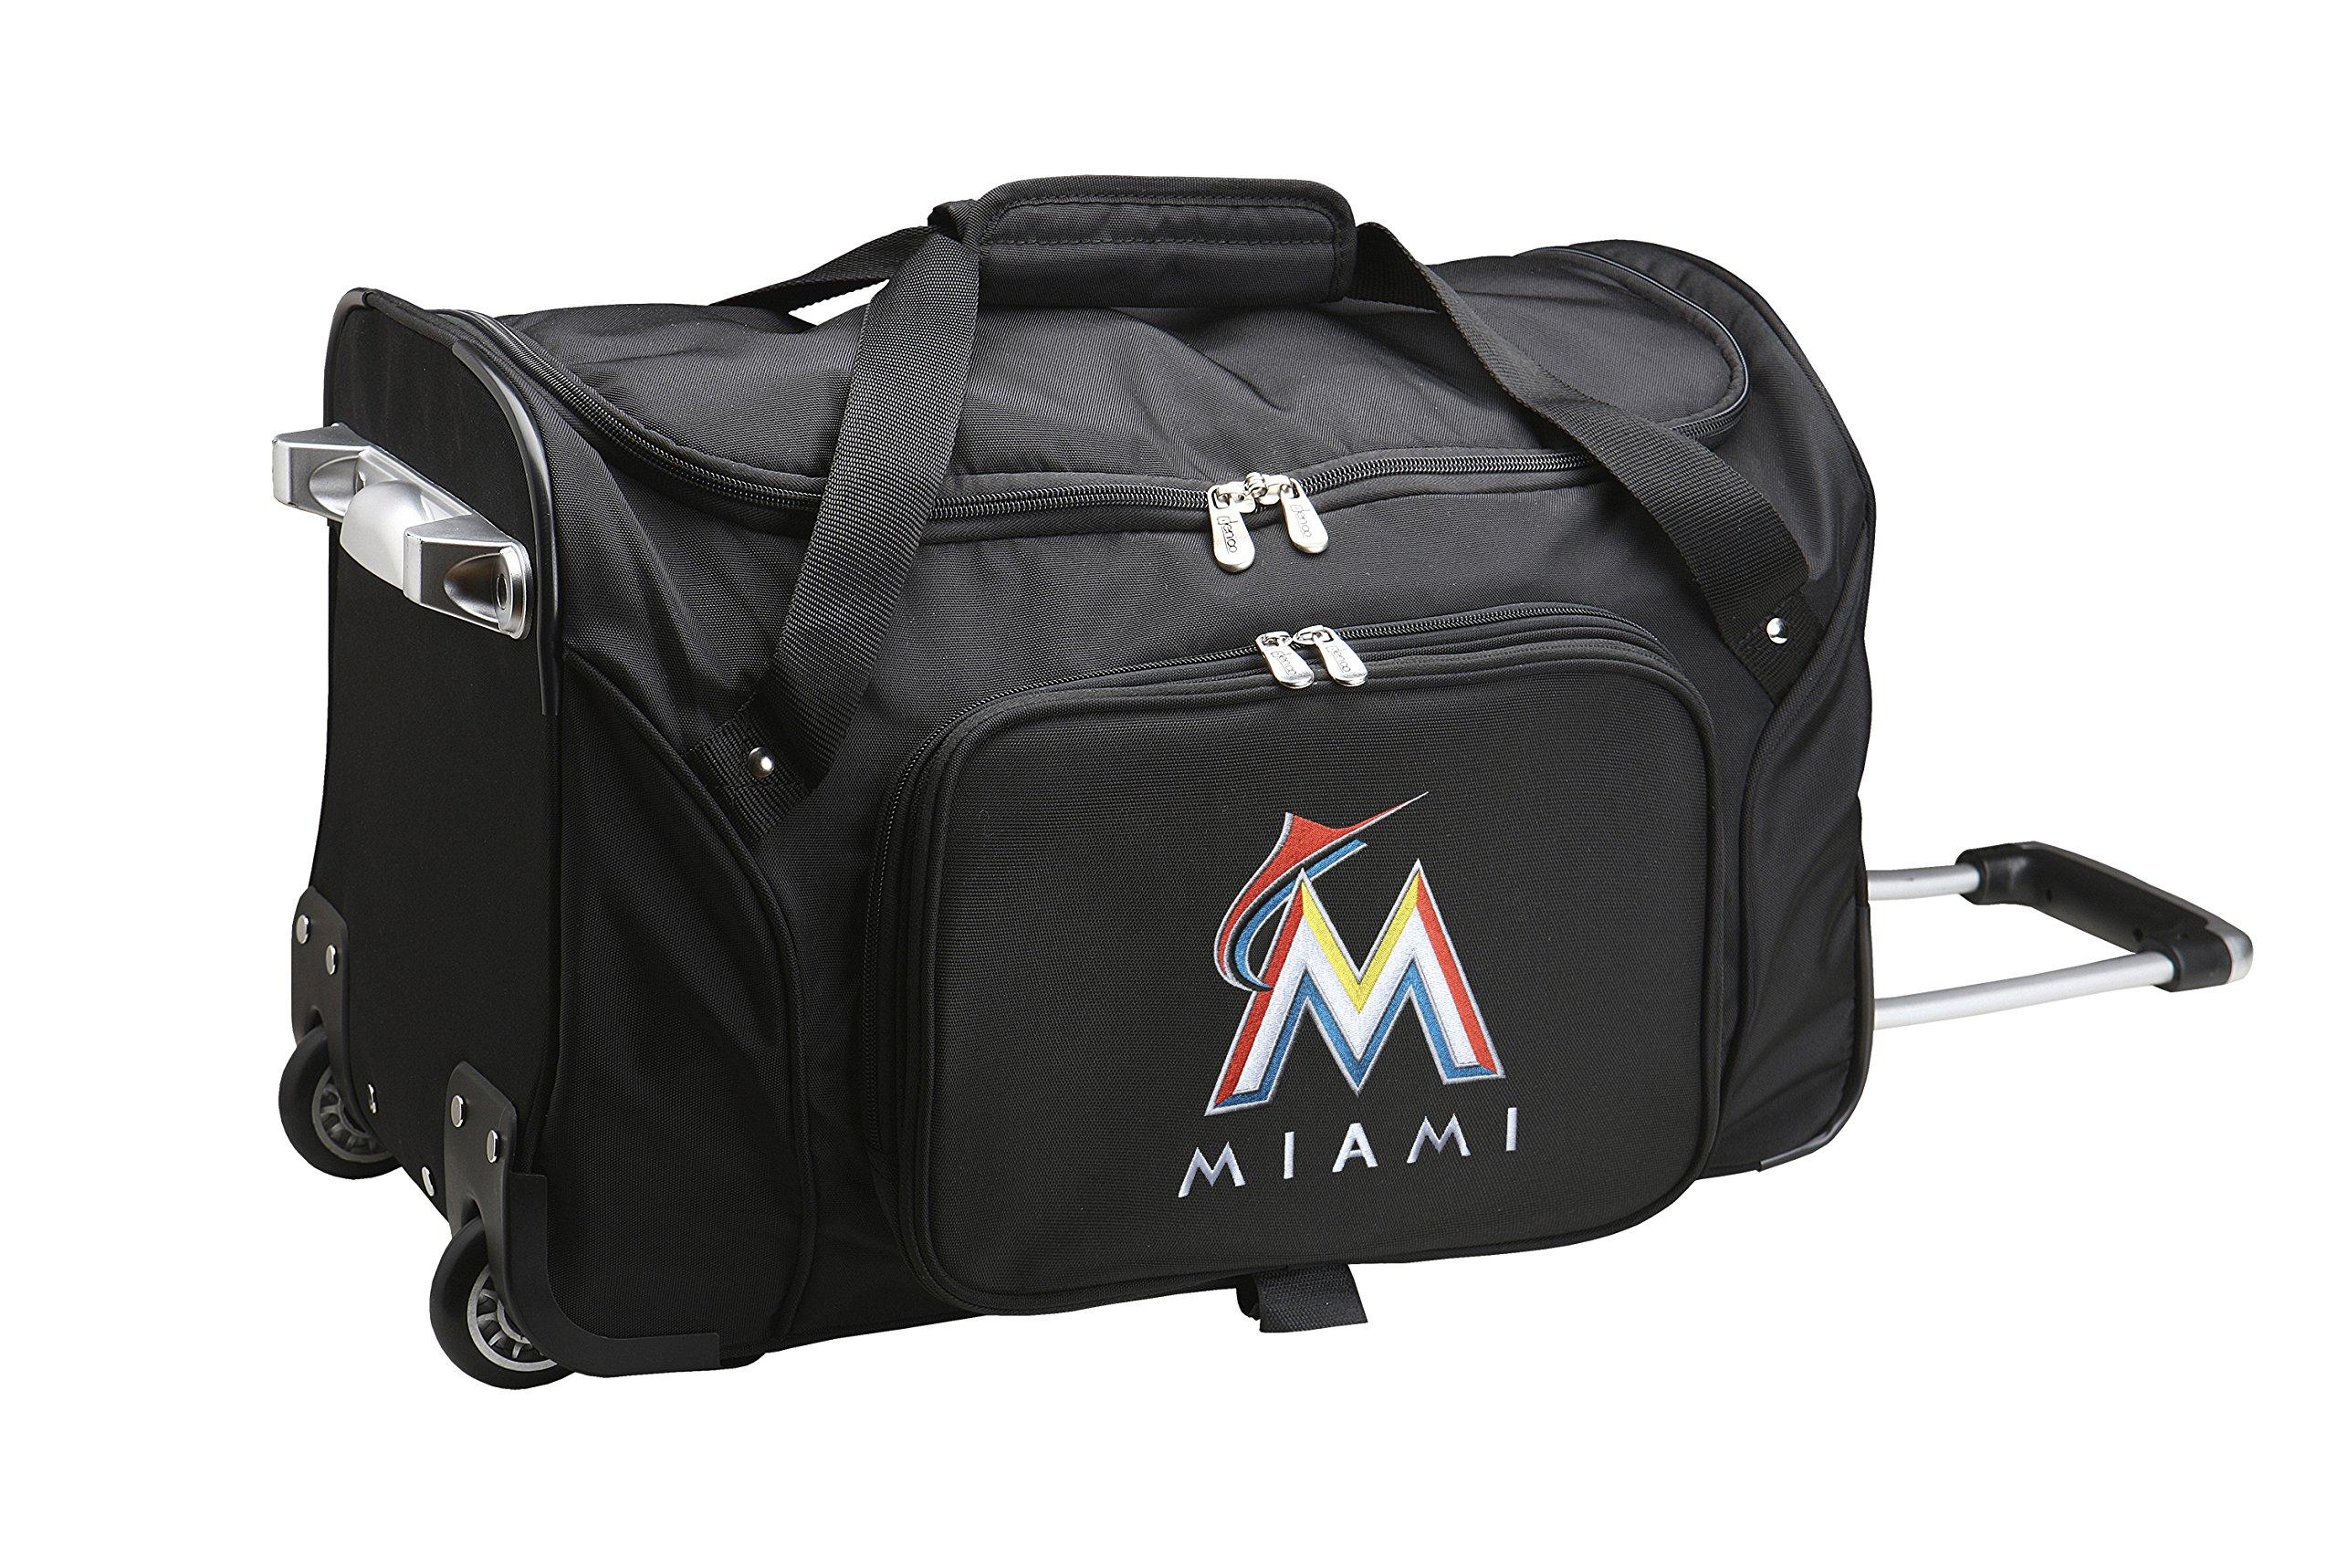 MLB Miami Marlins Wheeled Duffle Bag